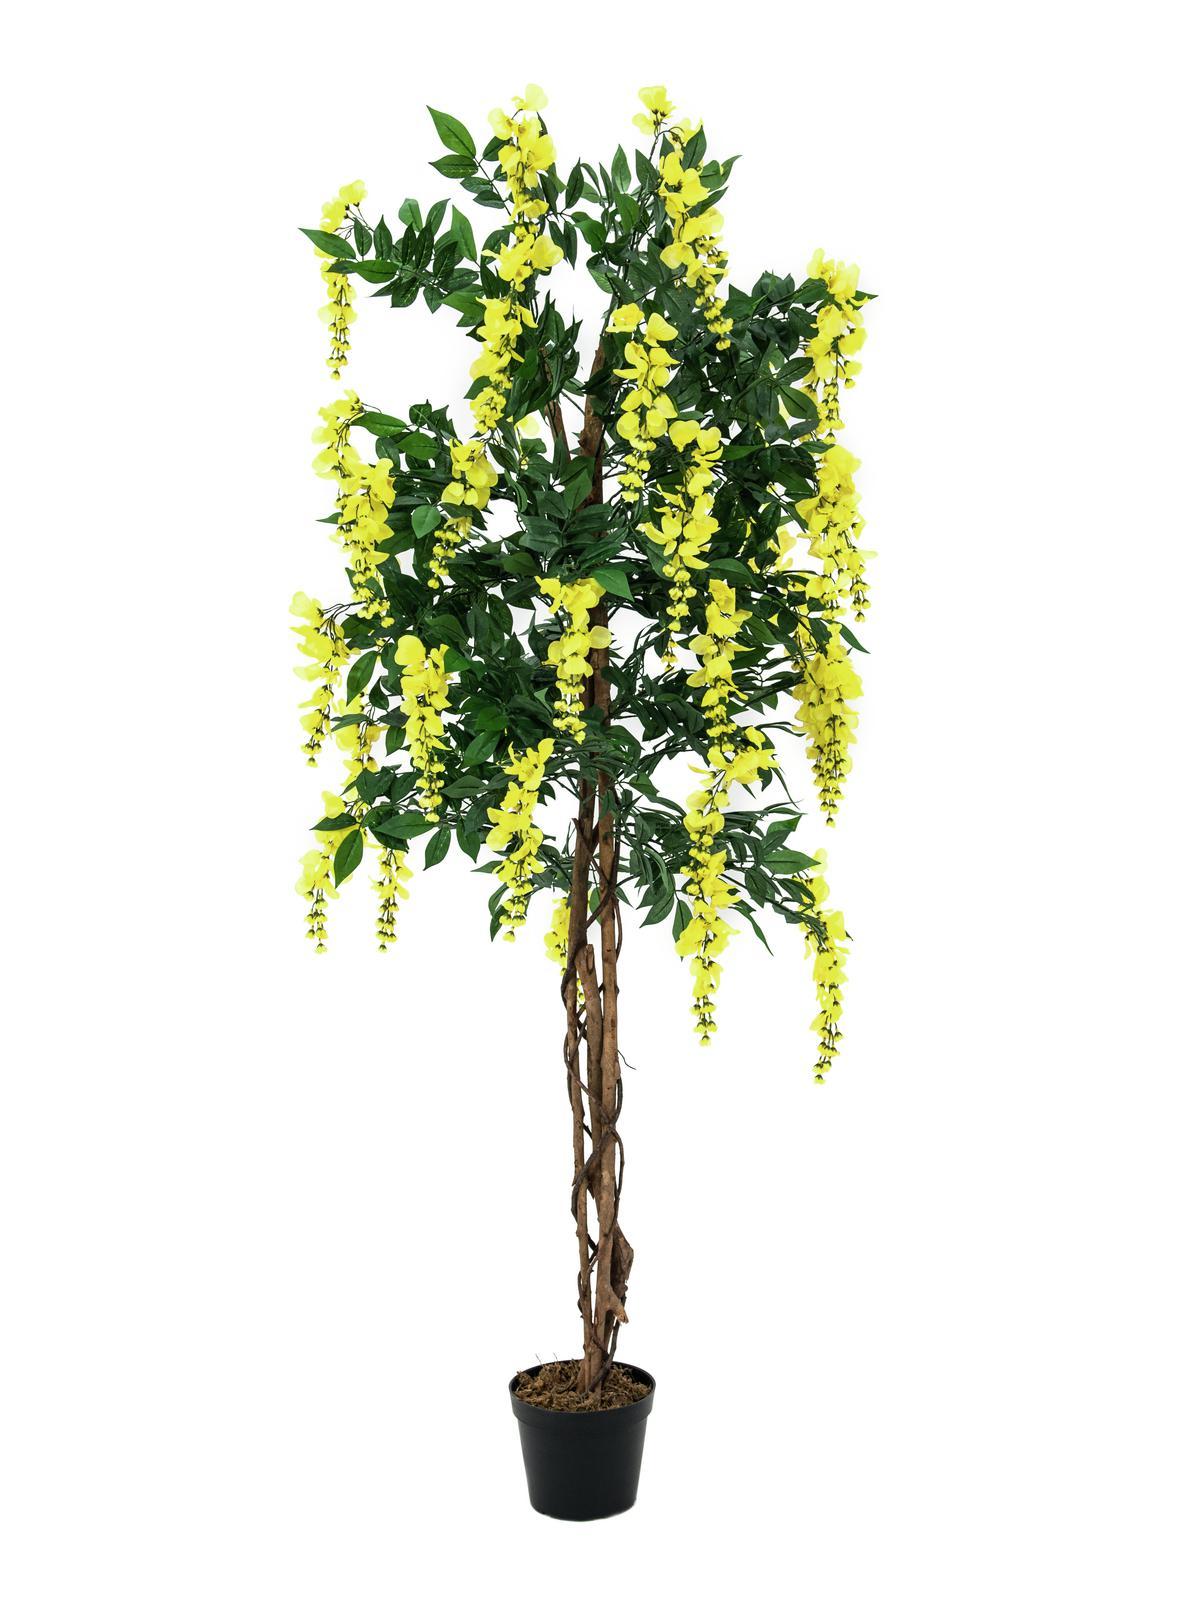 EUROPALMS Goldregenbaum, Kunstpflanze, gelb, 150cm